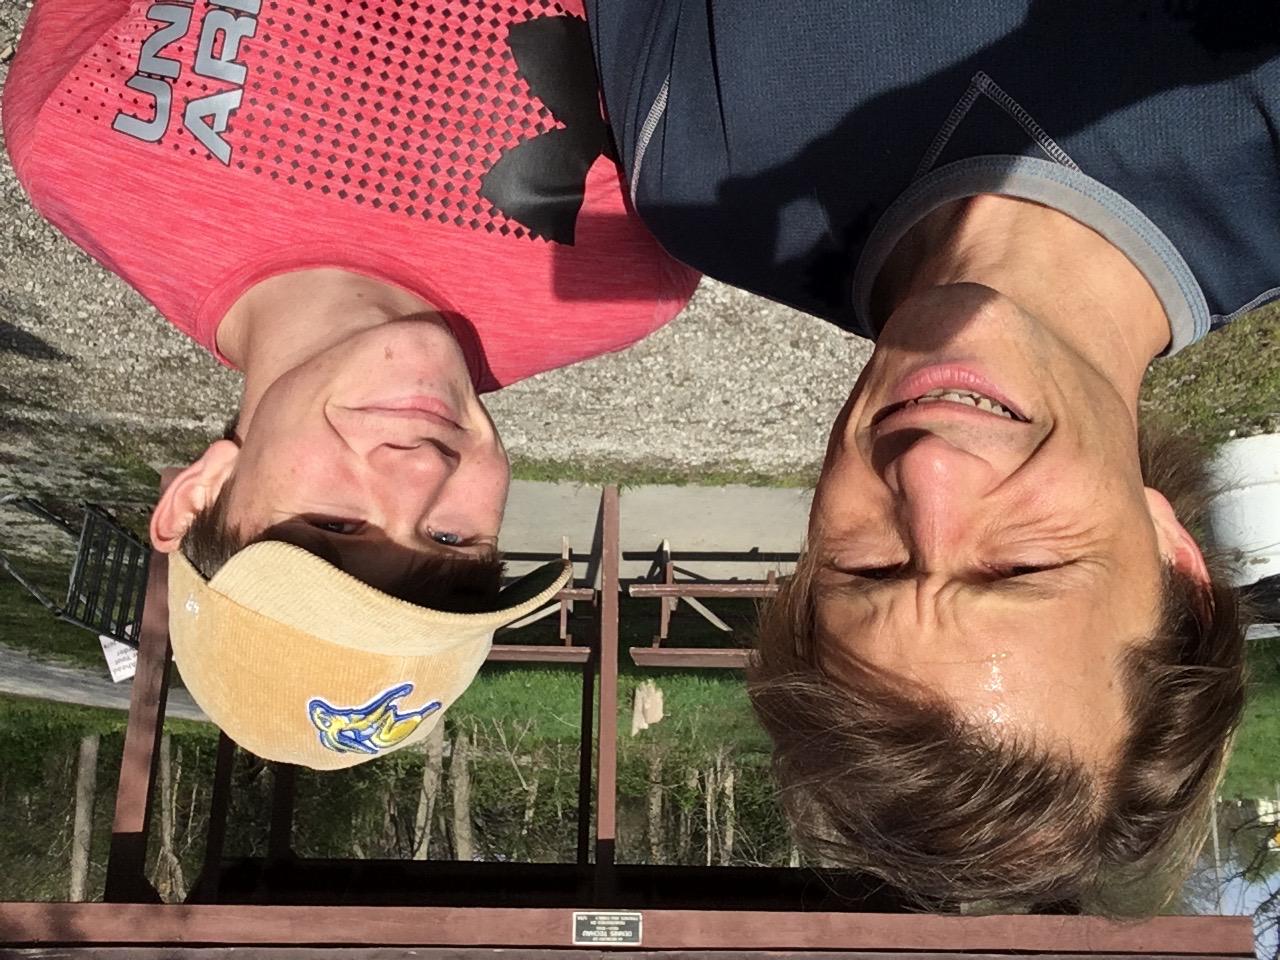 Luke and me at Mineola